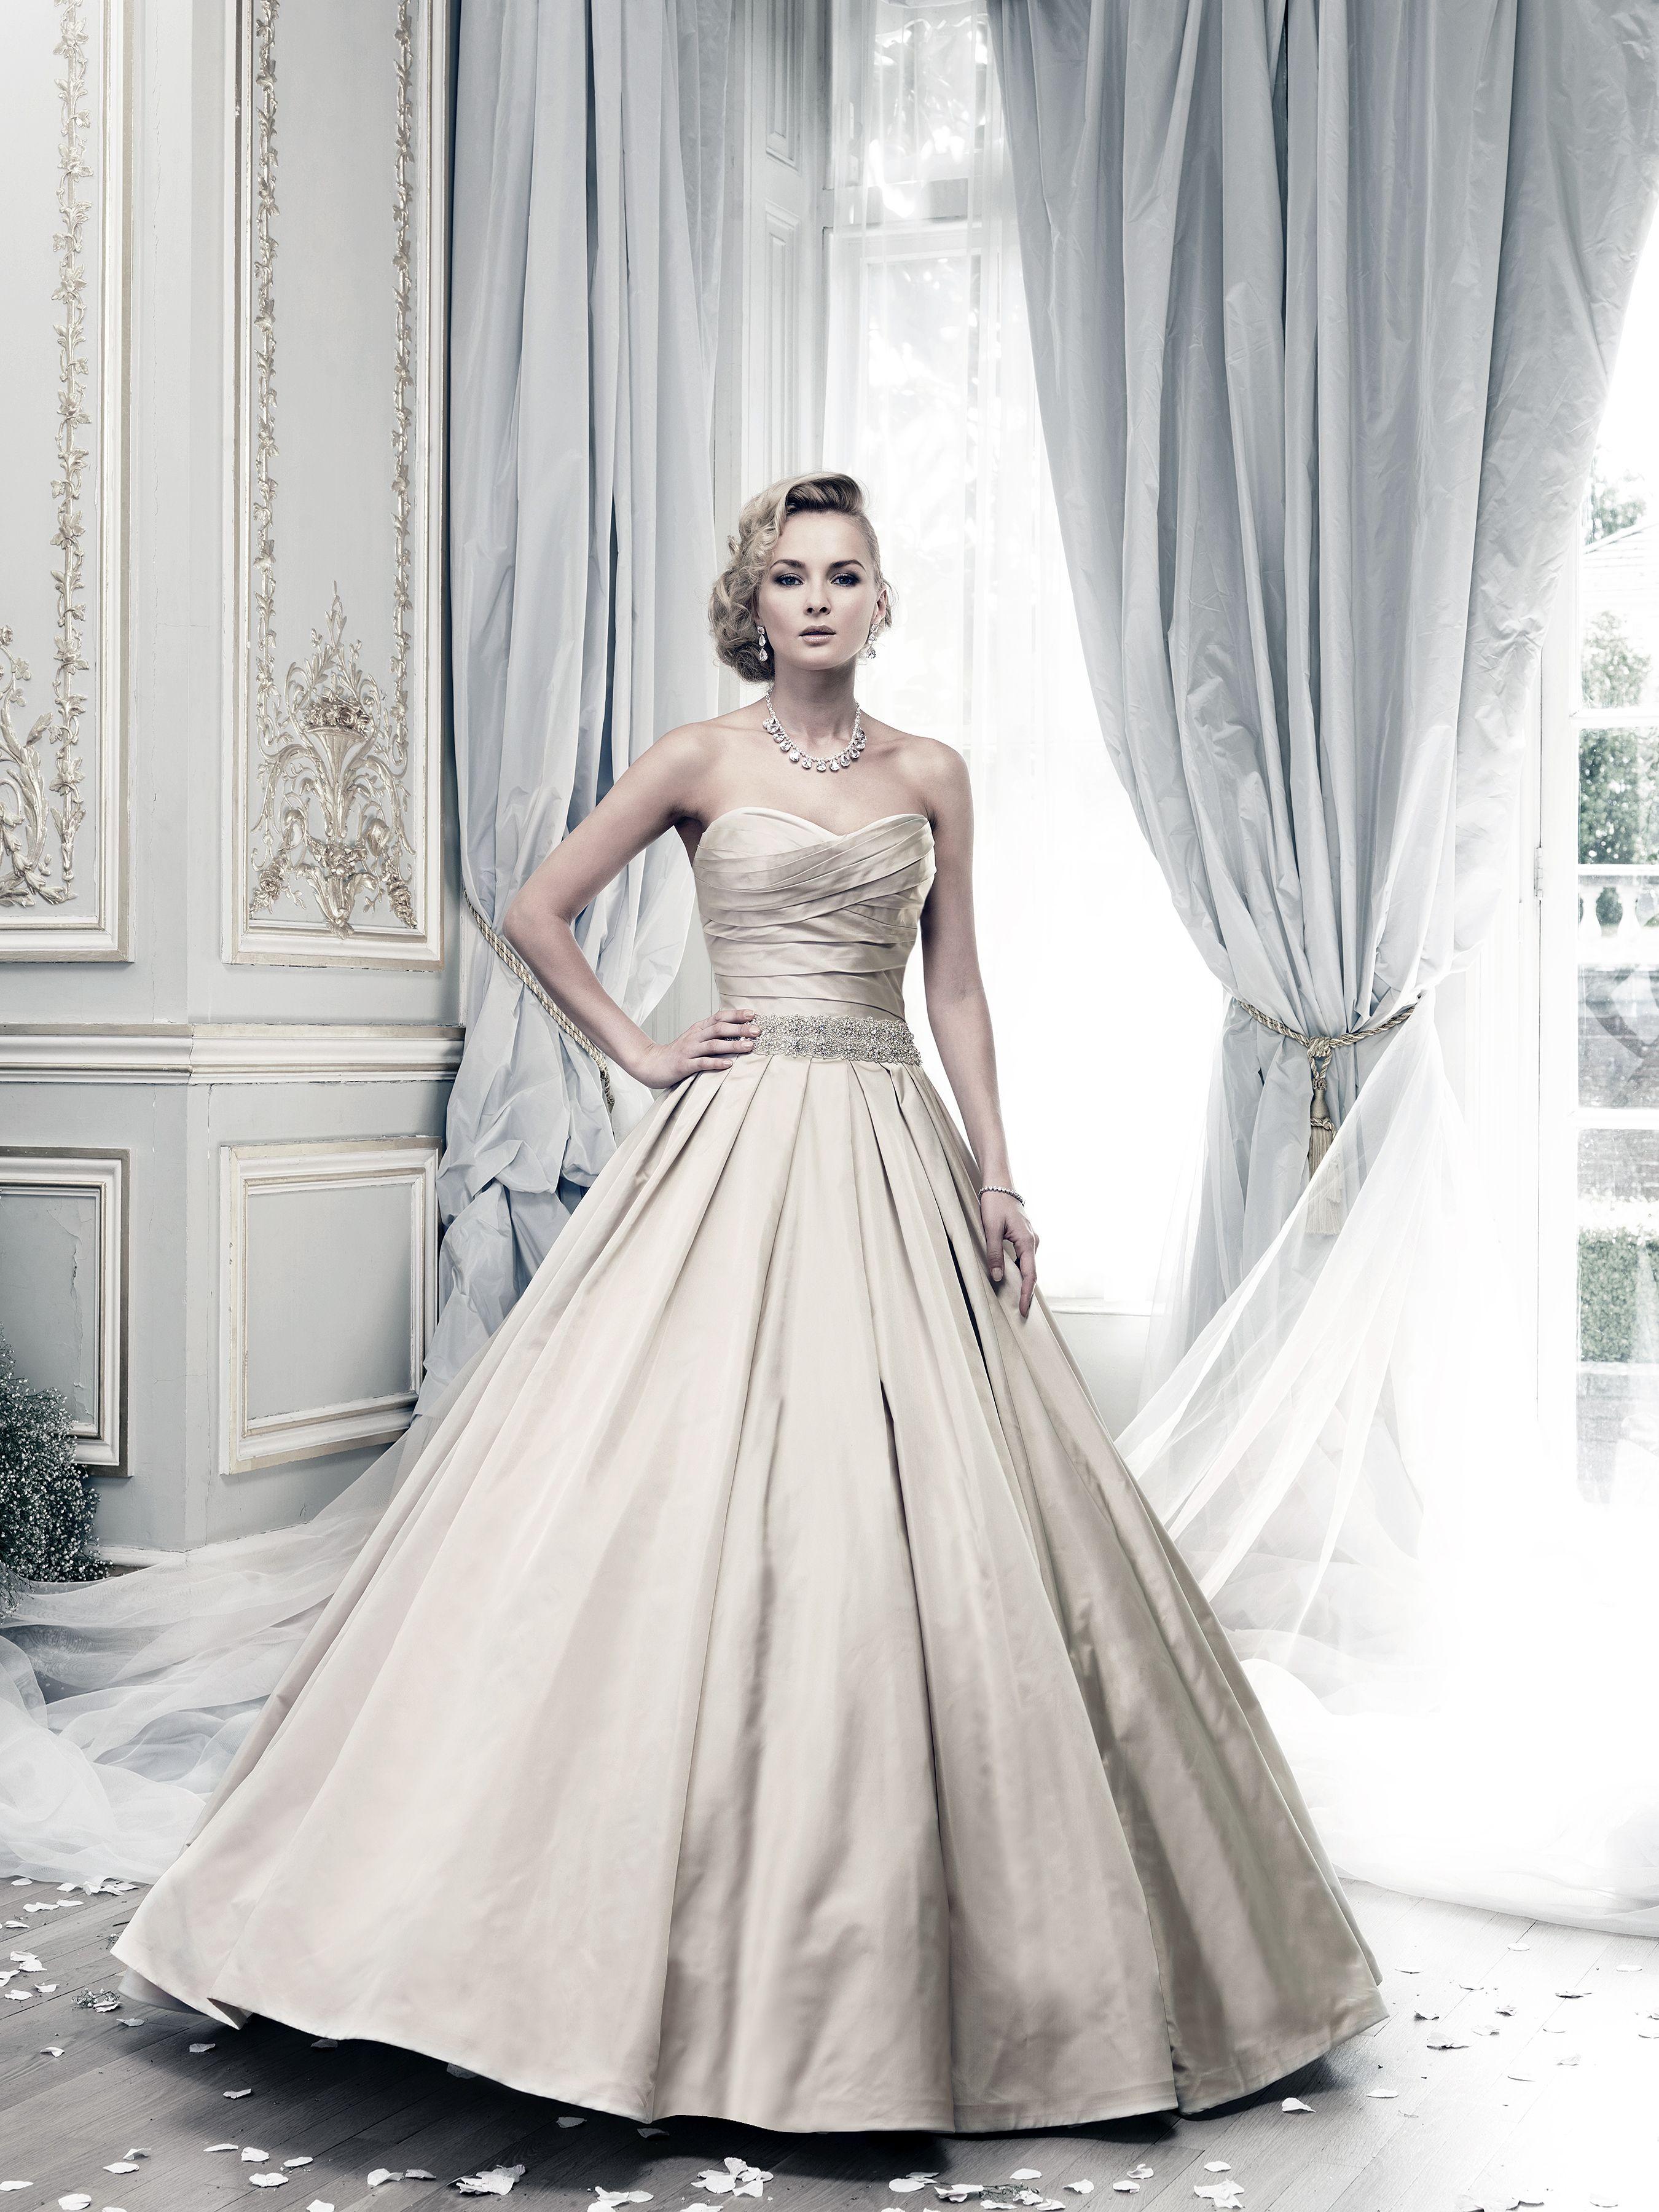 Coloured Wedding Dresses From Top UK Bridal Designers | Brautkleider ...